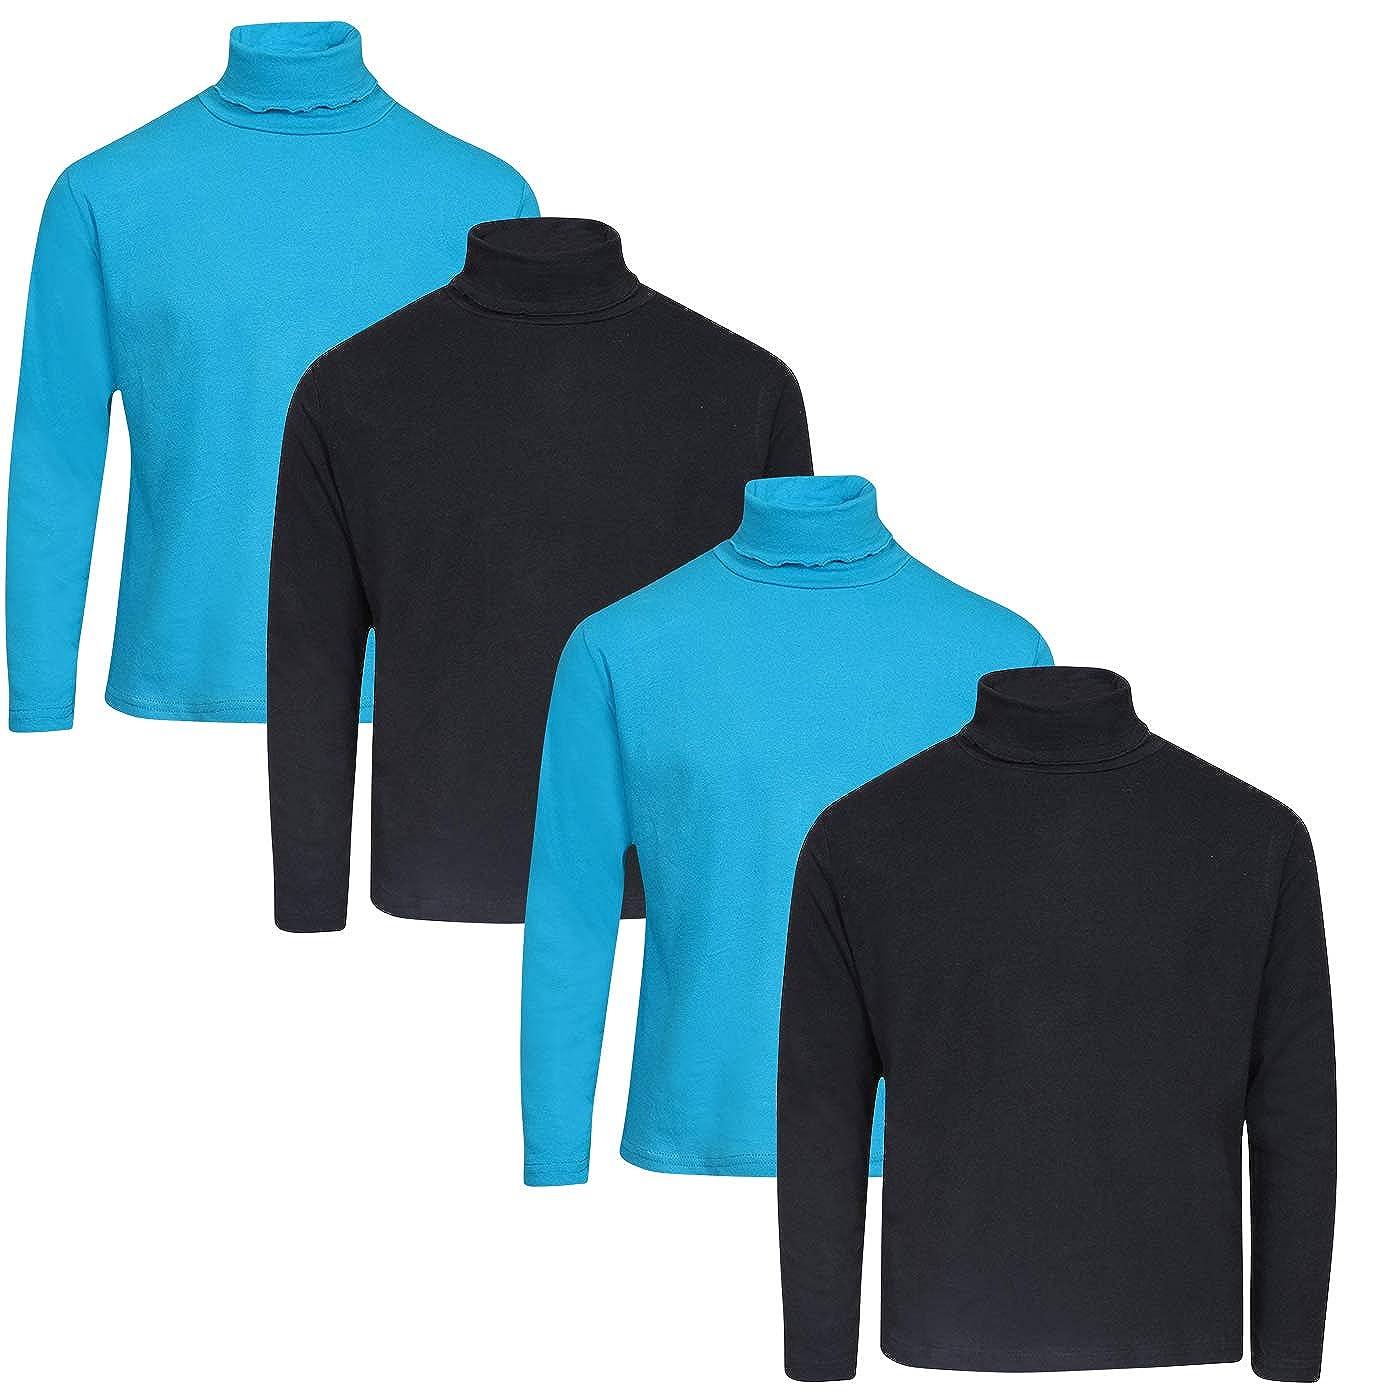 dELiAs Girls Solid Long Sleeve Turtlenecks 4 Pack